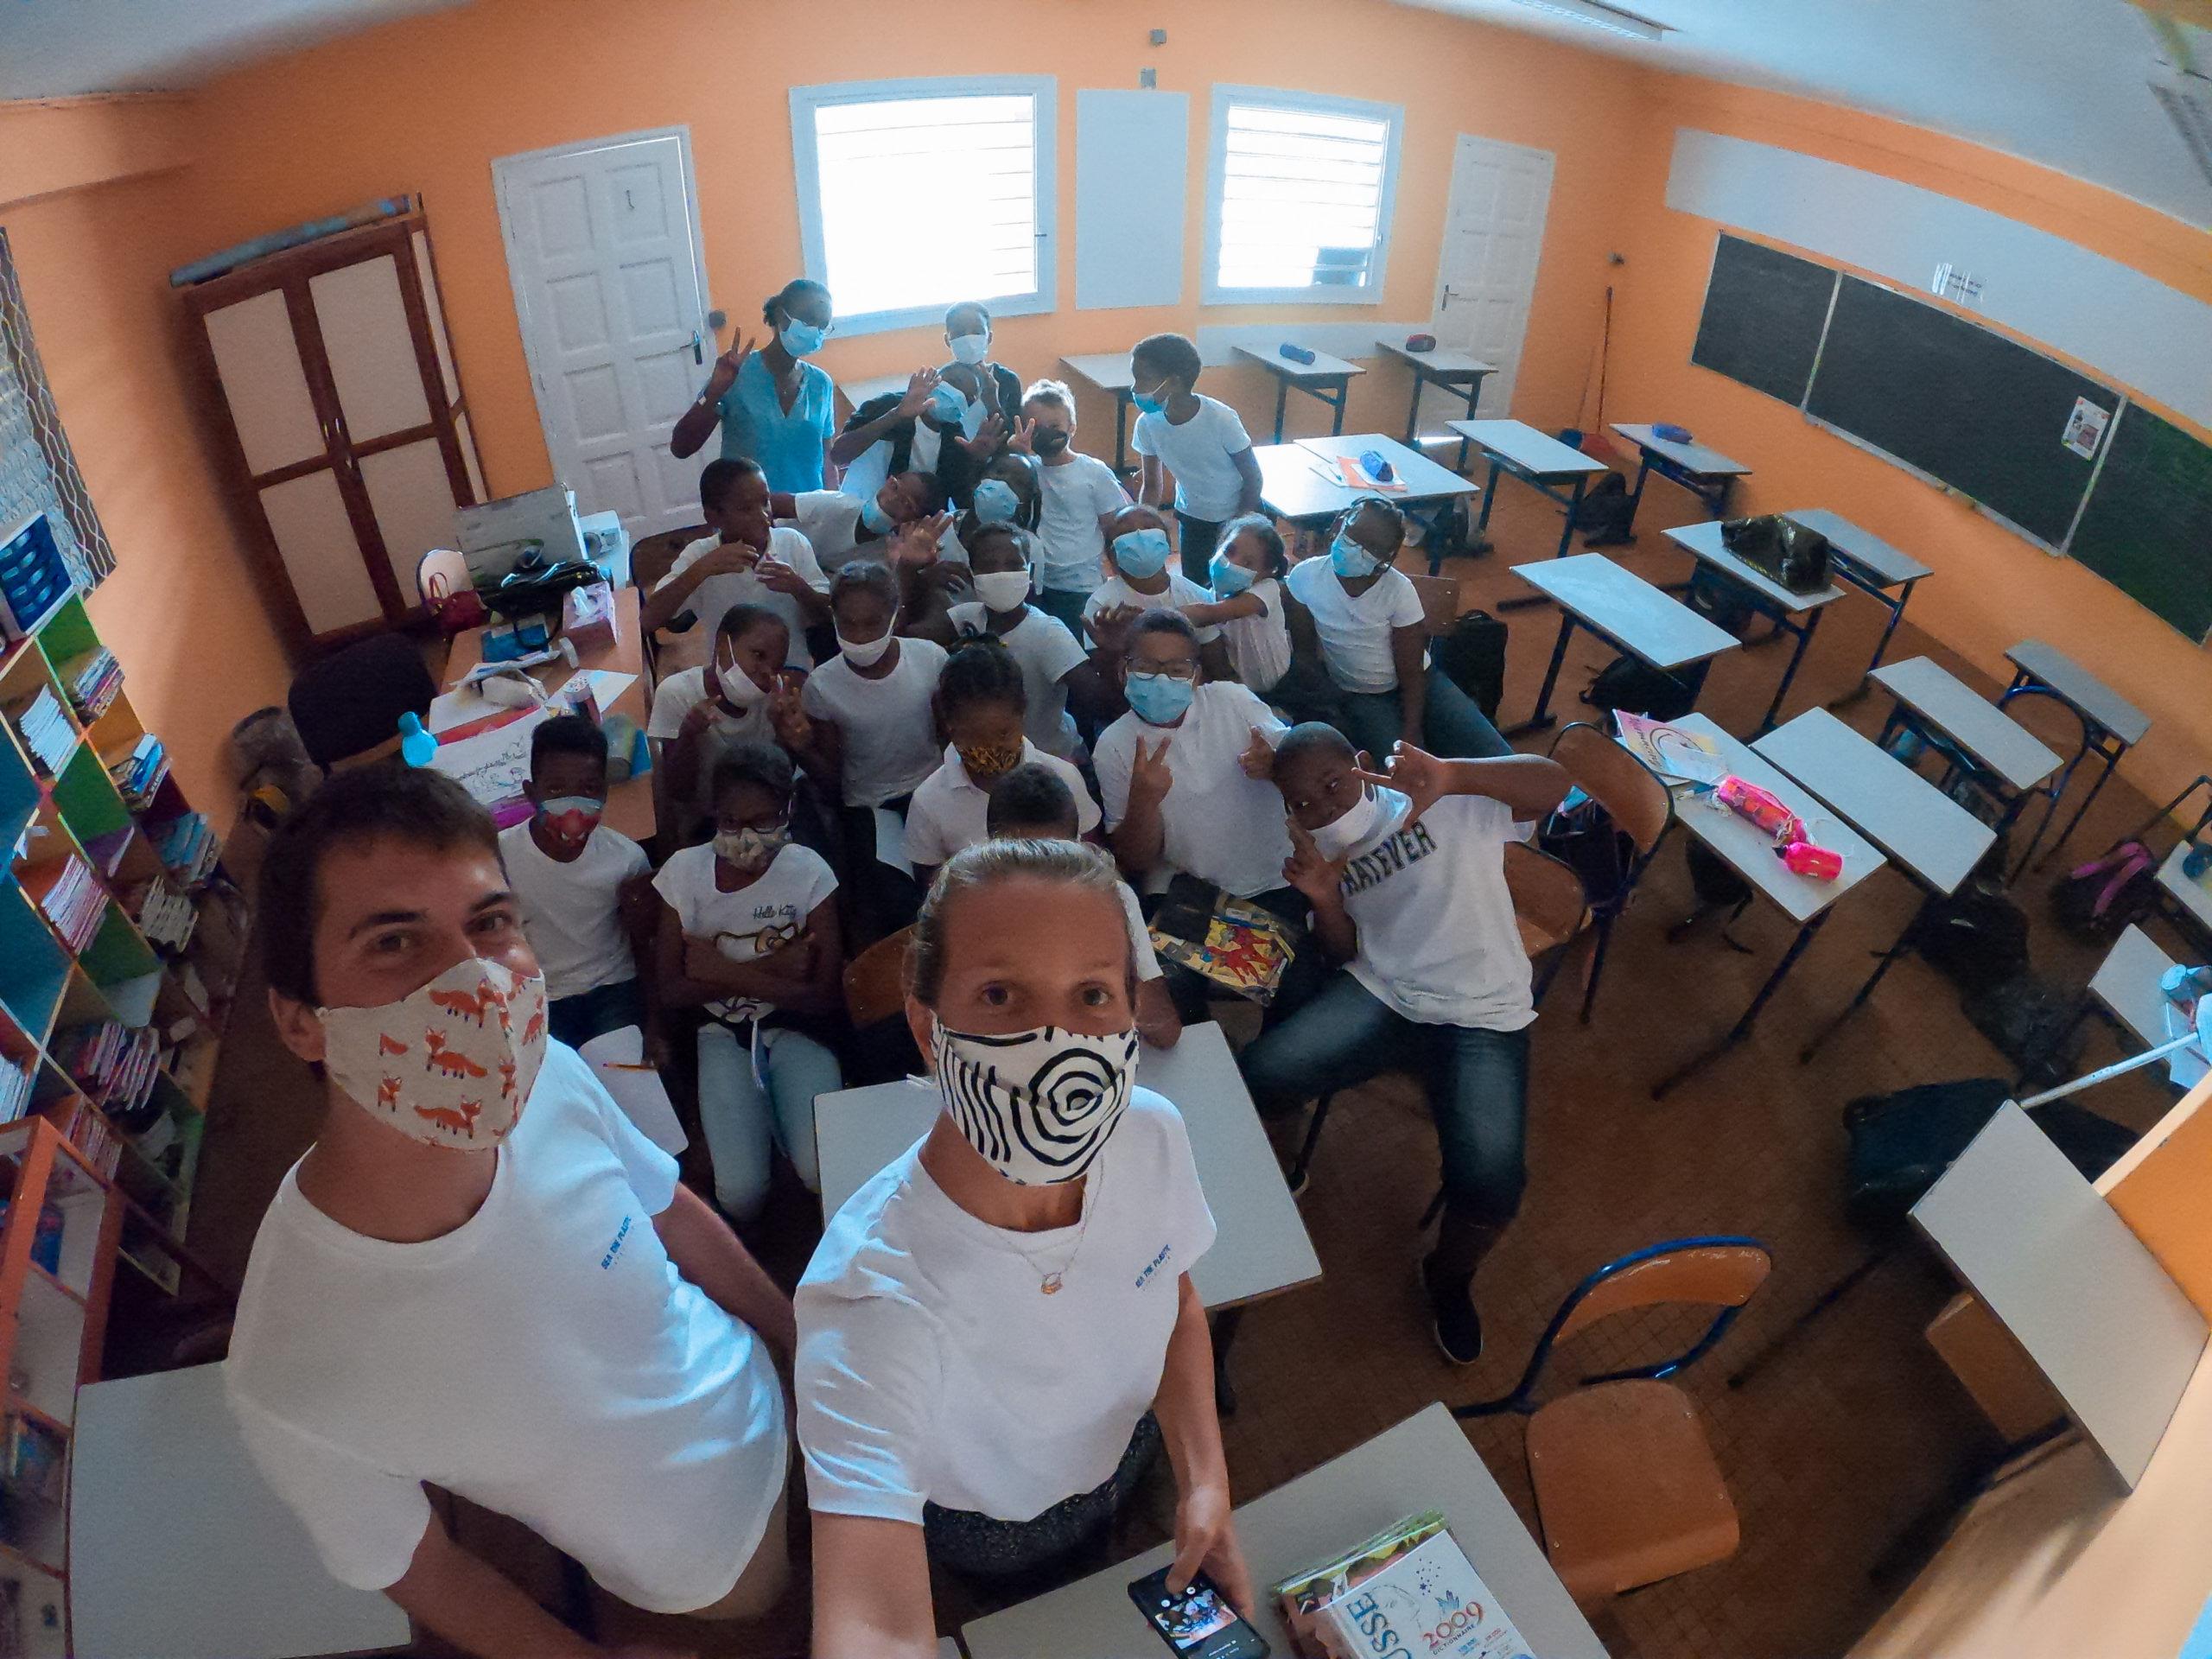 seatheplastic school awarenesses eductation